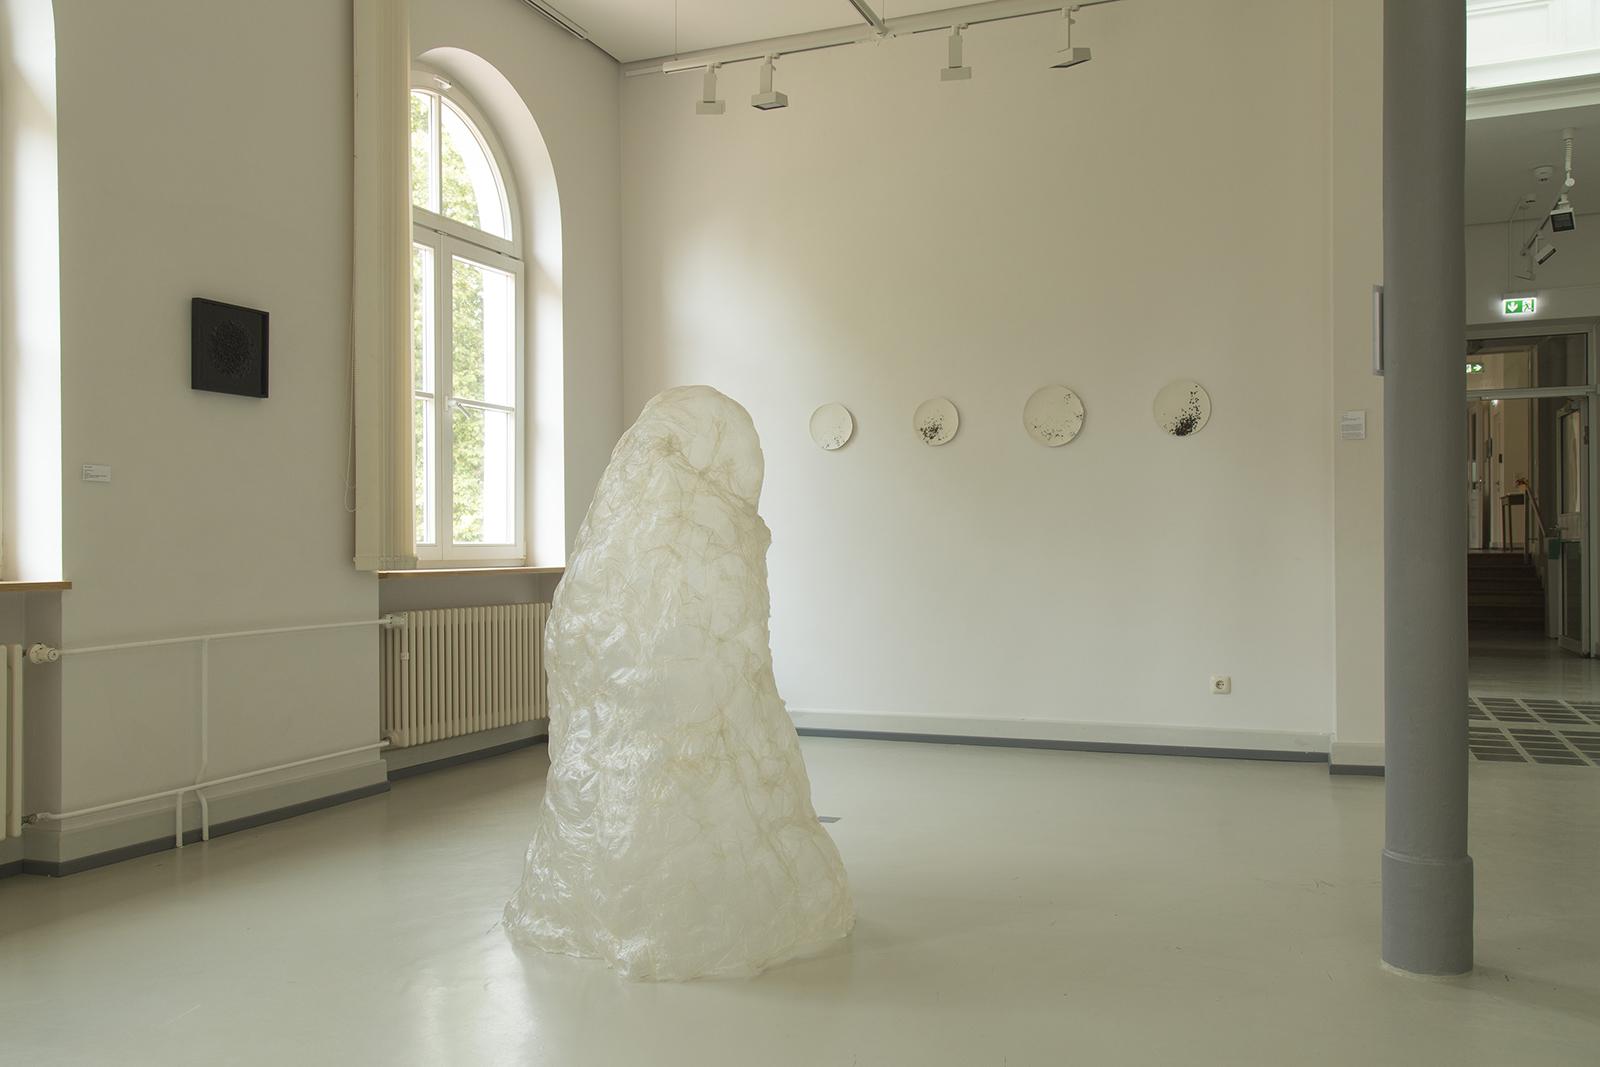 Katja v. Ruville, installation view ©2017 Image: Anna Meuer